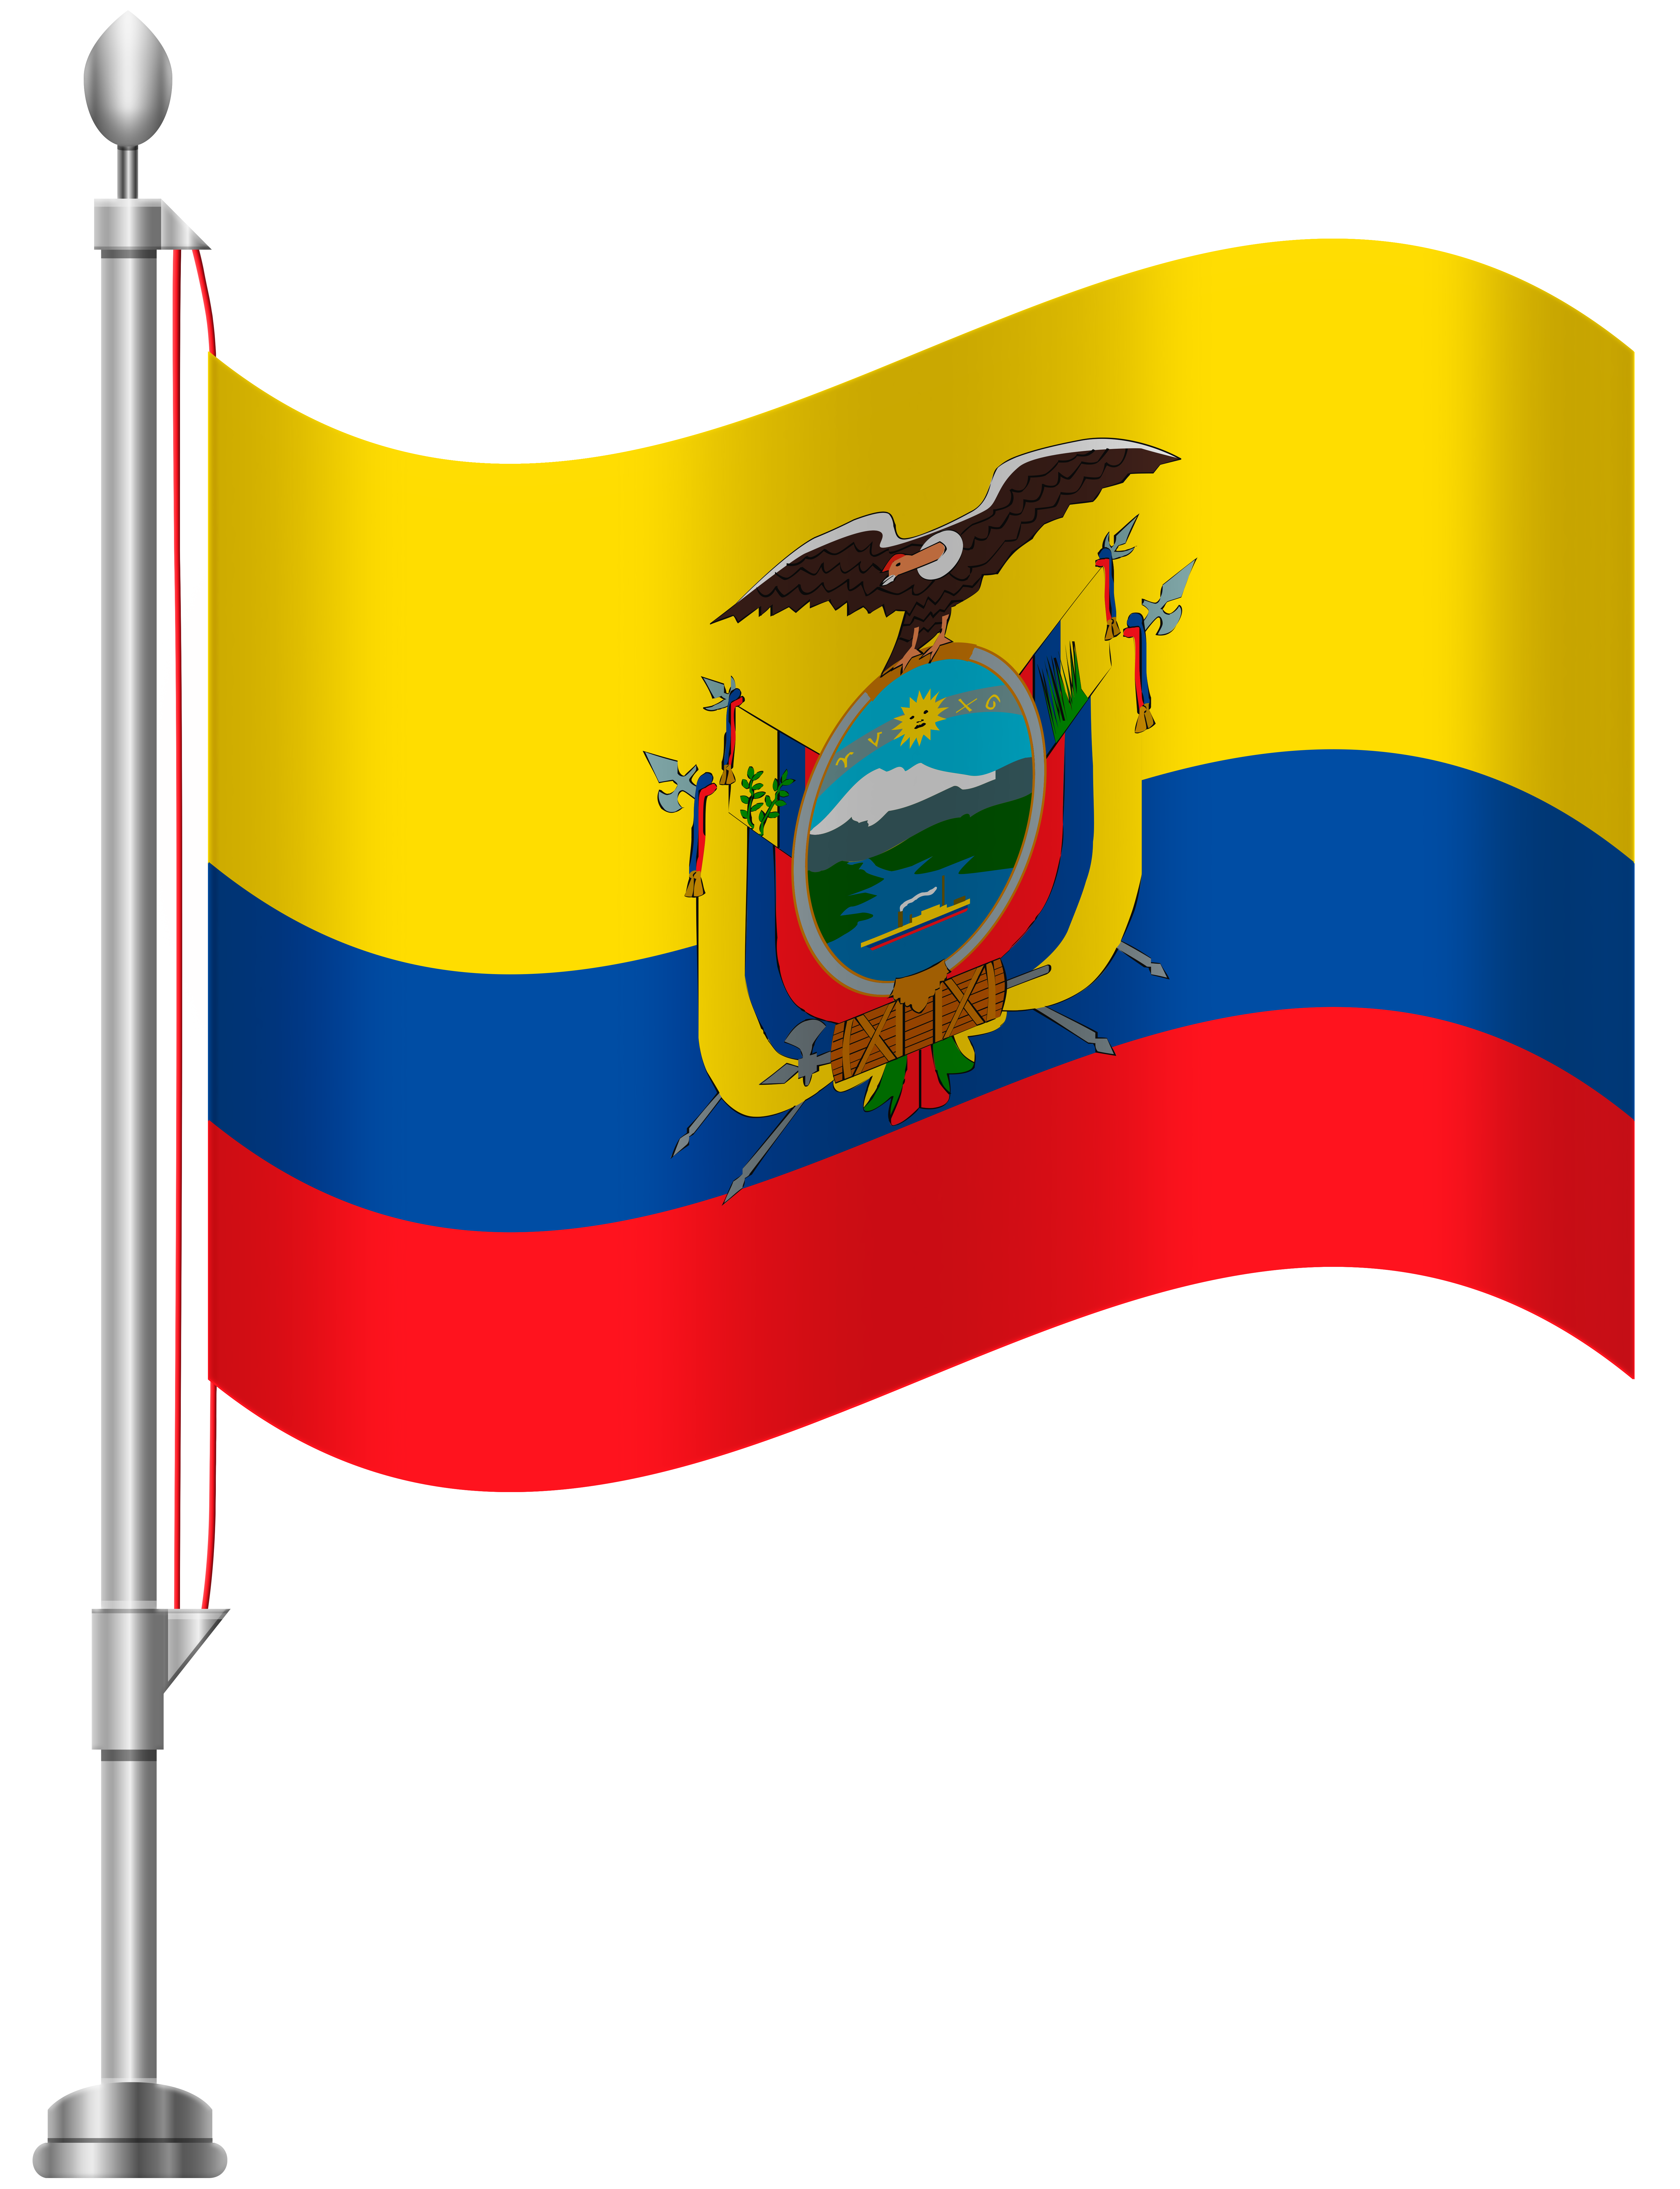 Ecuador clipart #3, Download drawings